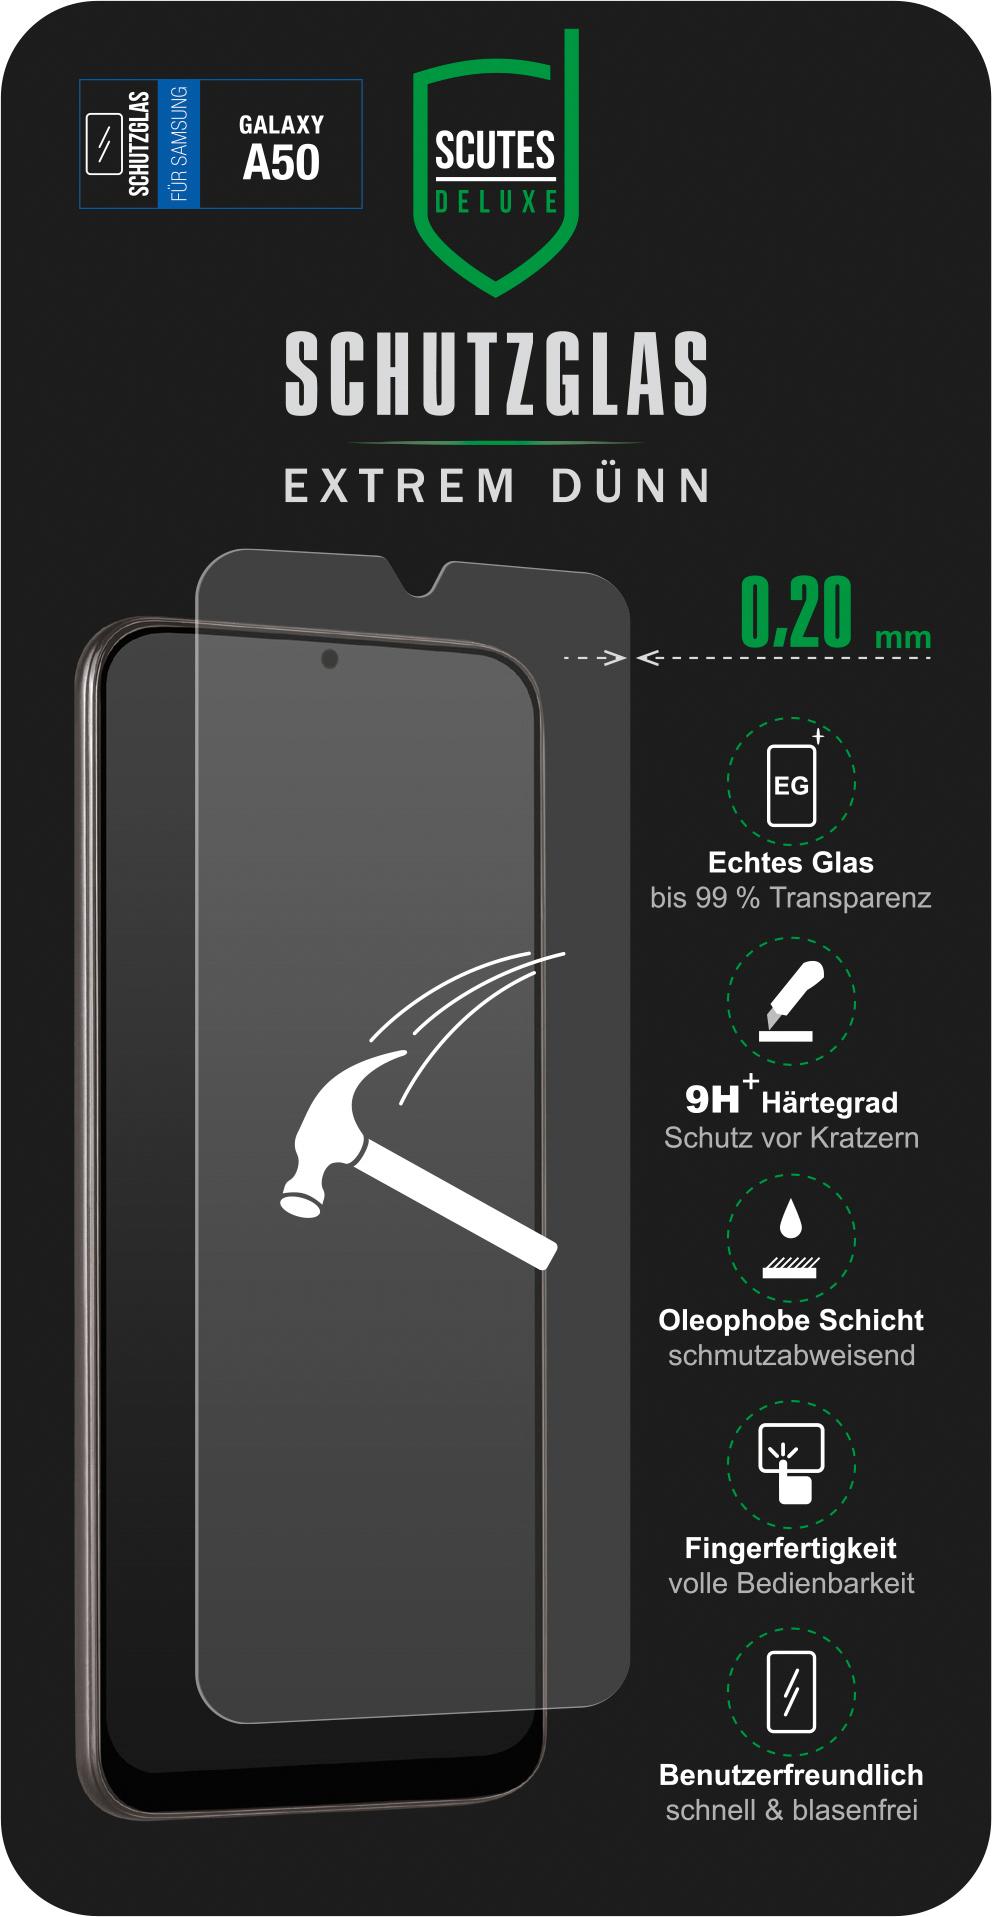 Schutzglas (Samsung Galaxy A50)